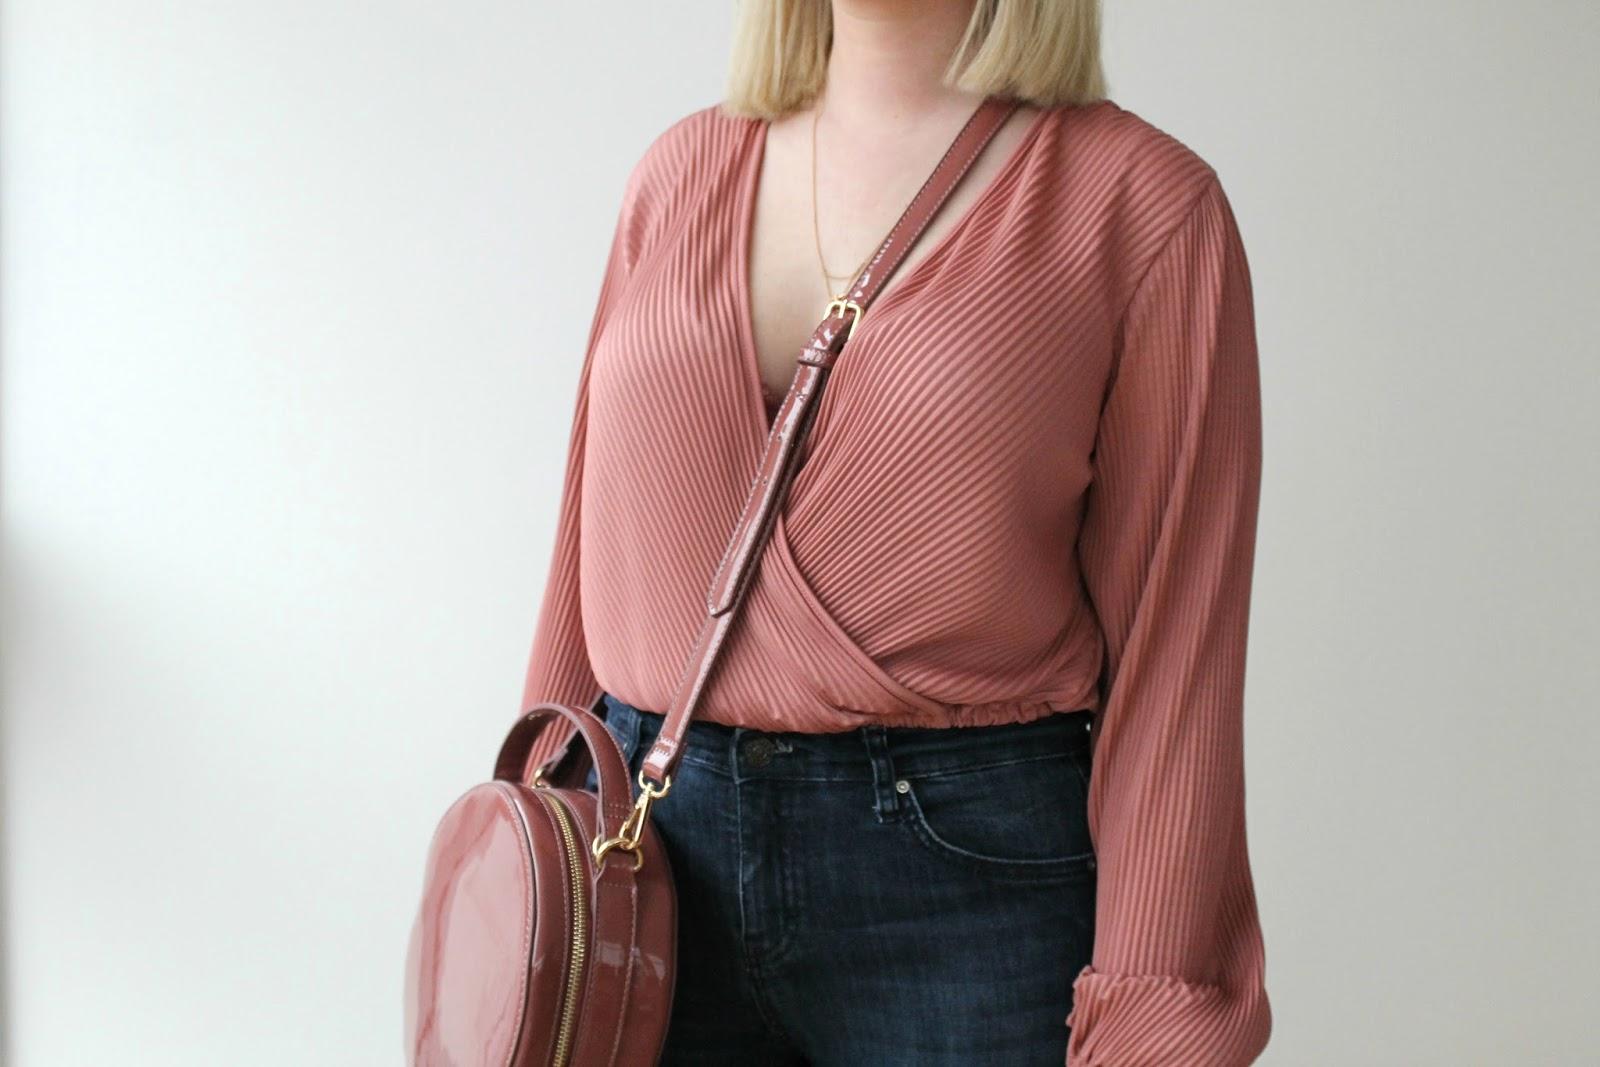 Pink wrap top, pink patent bag, Topshop Jamie jeans, Nude heeled sandals